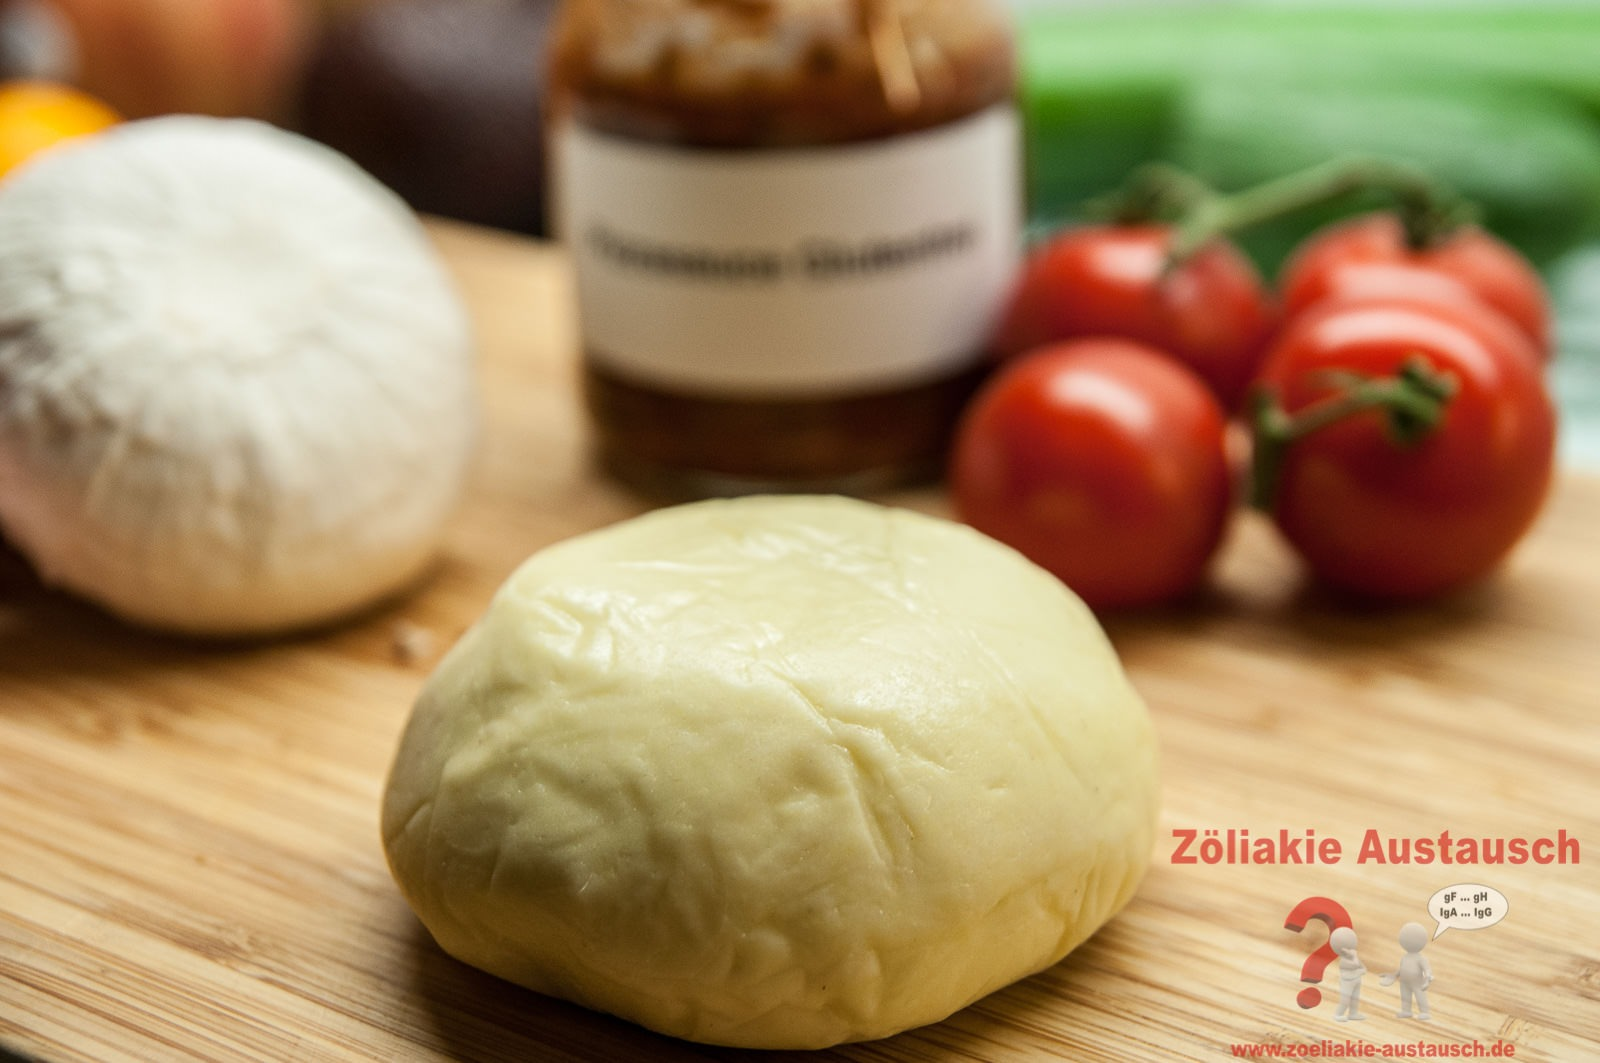 Zoeliakie_Austausch_Gizza_002